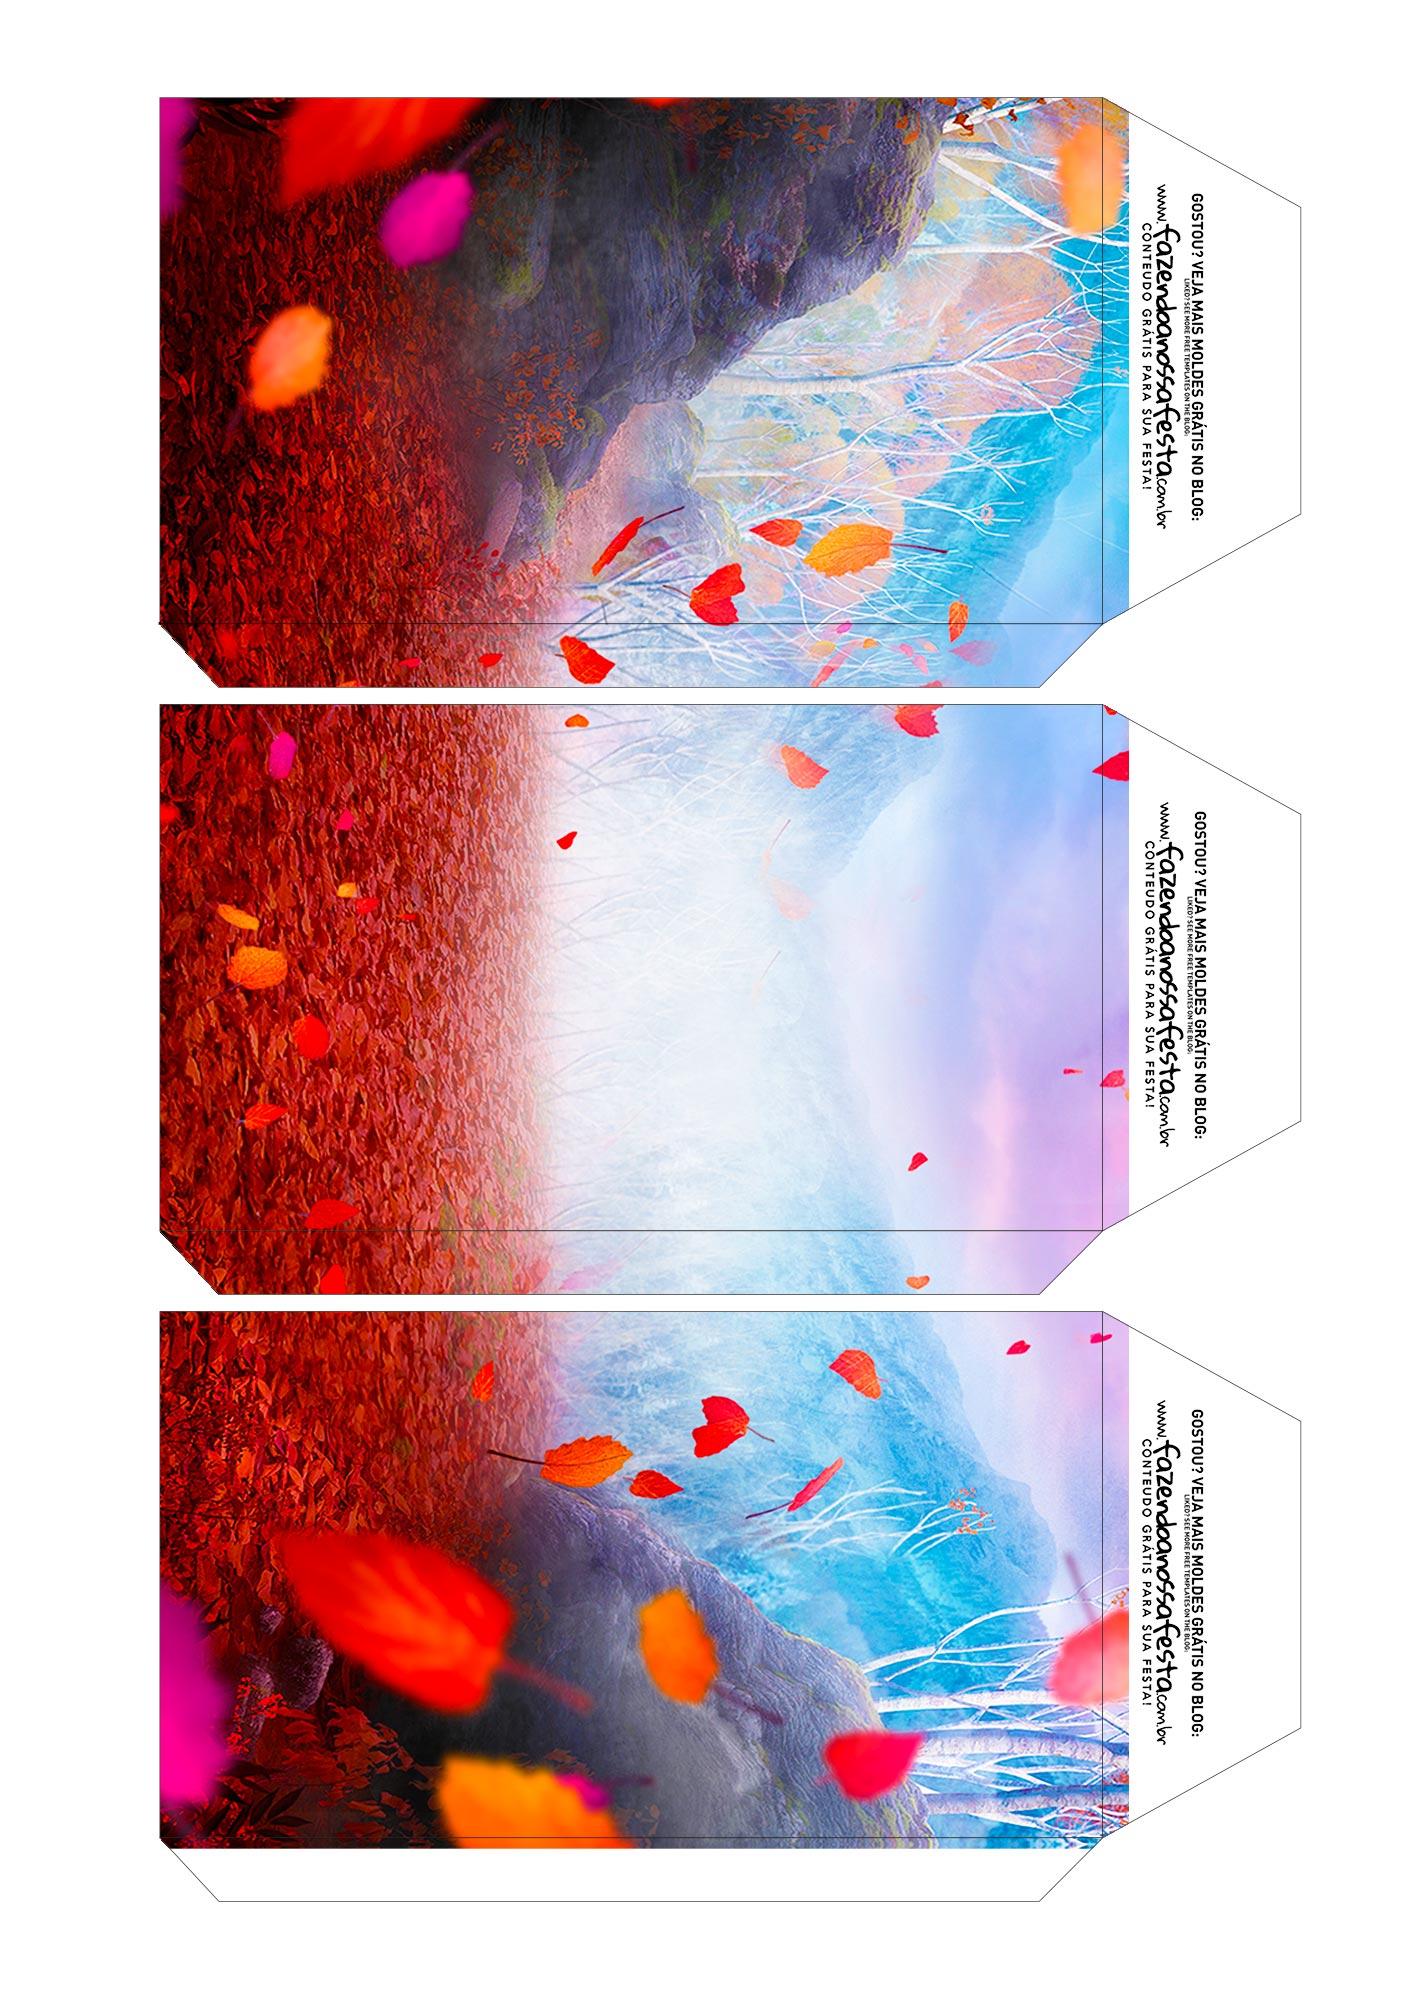 Caixa Explosiva Pascoa Frozen 2 4